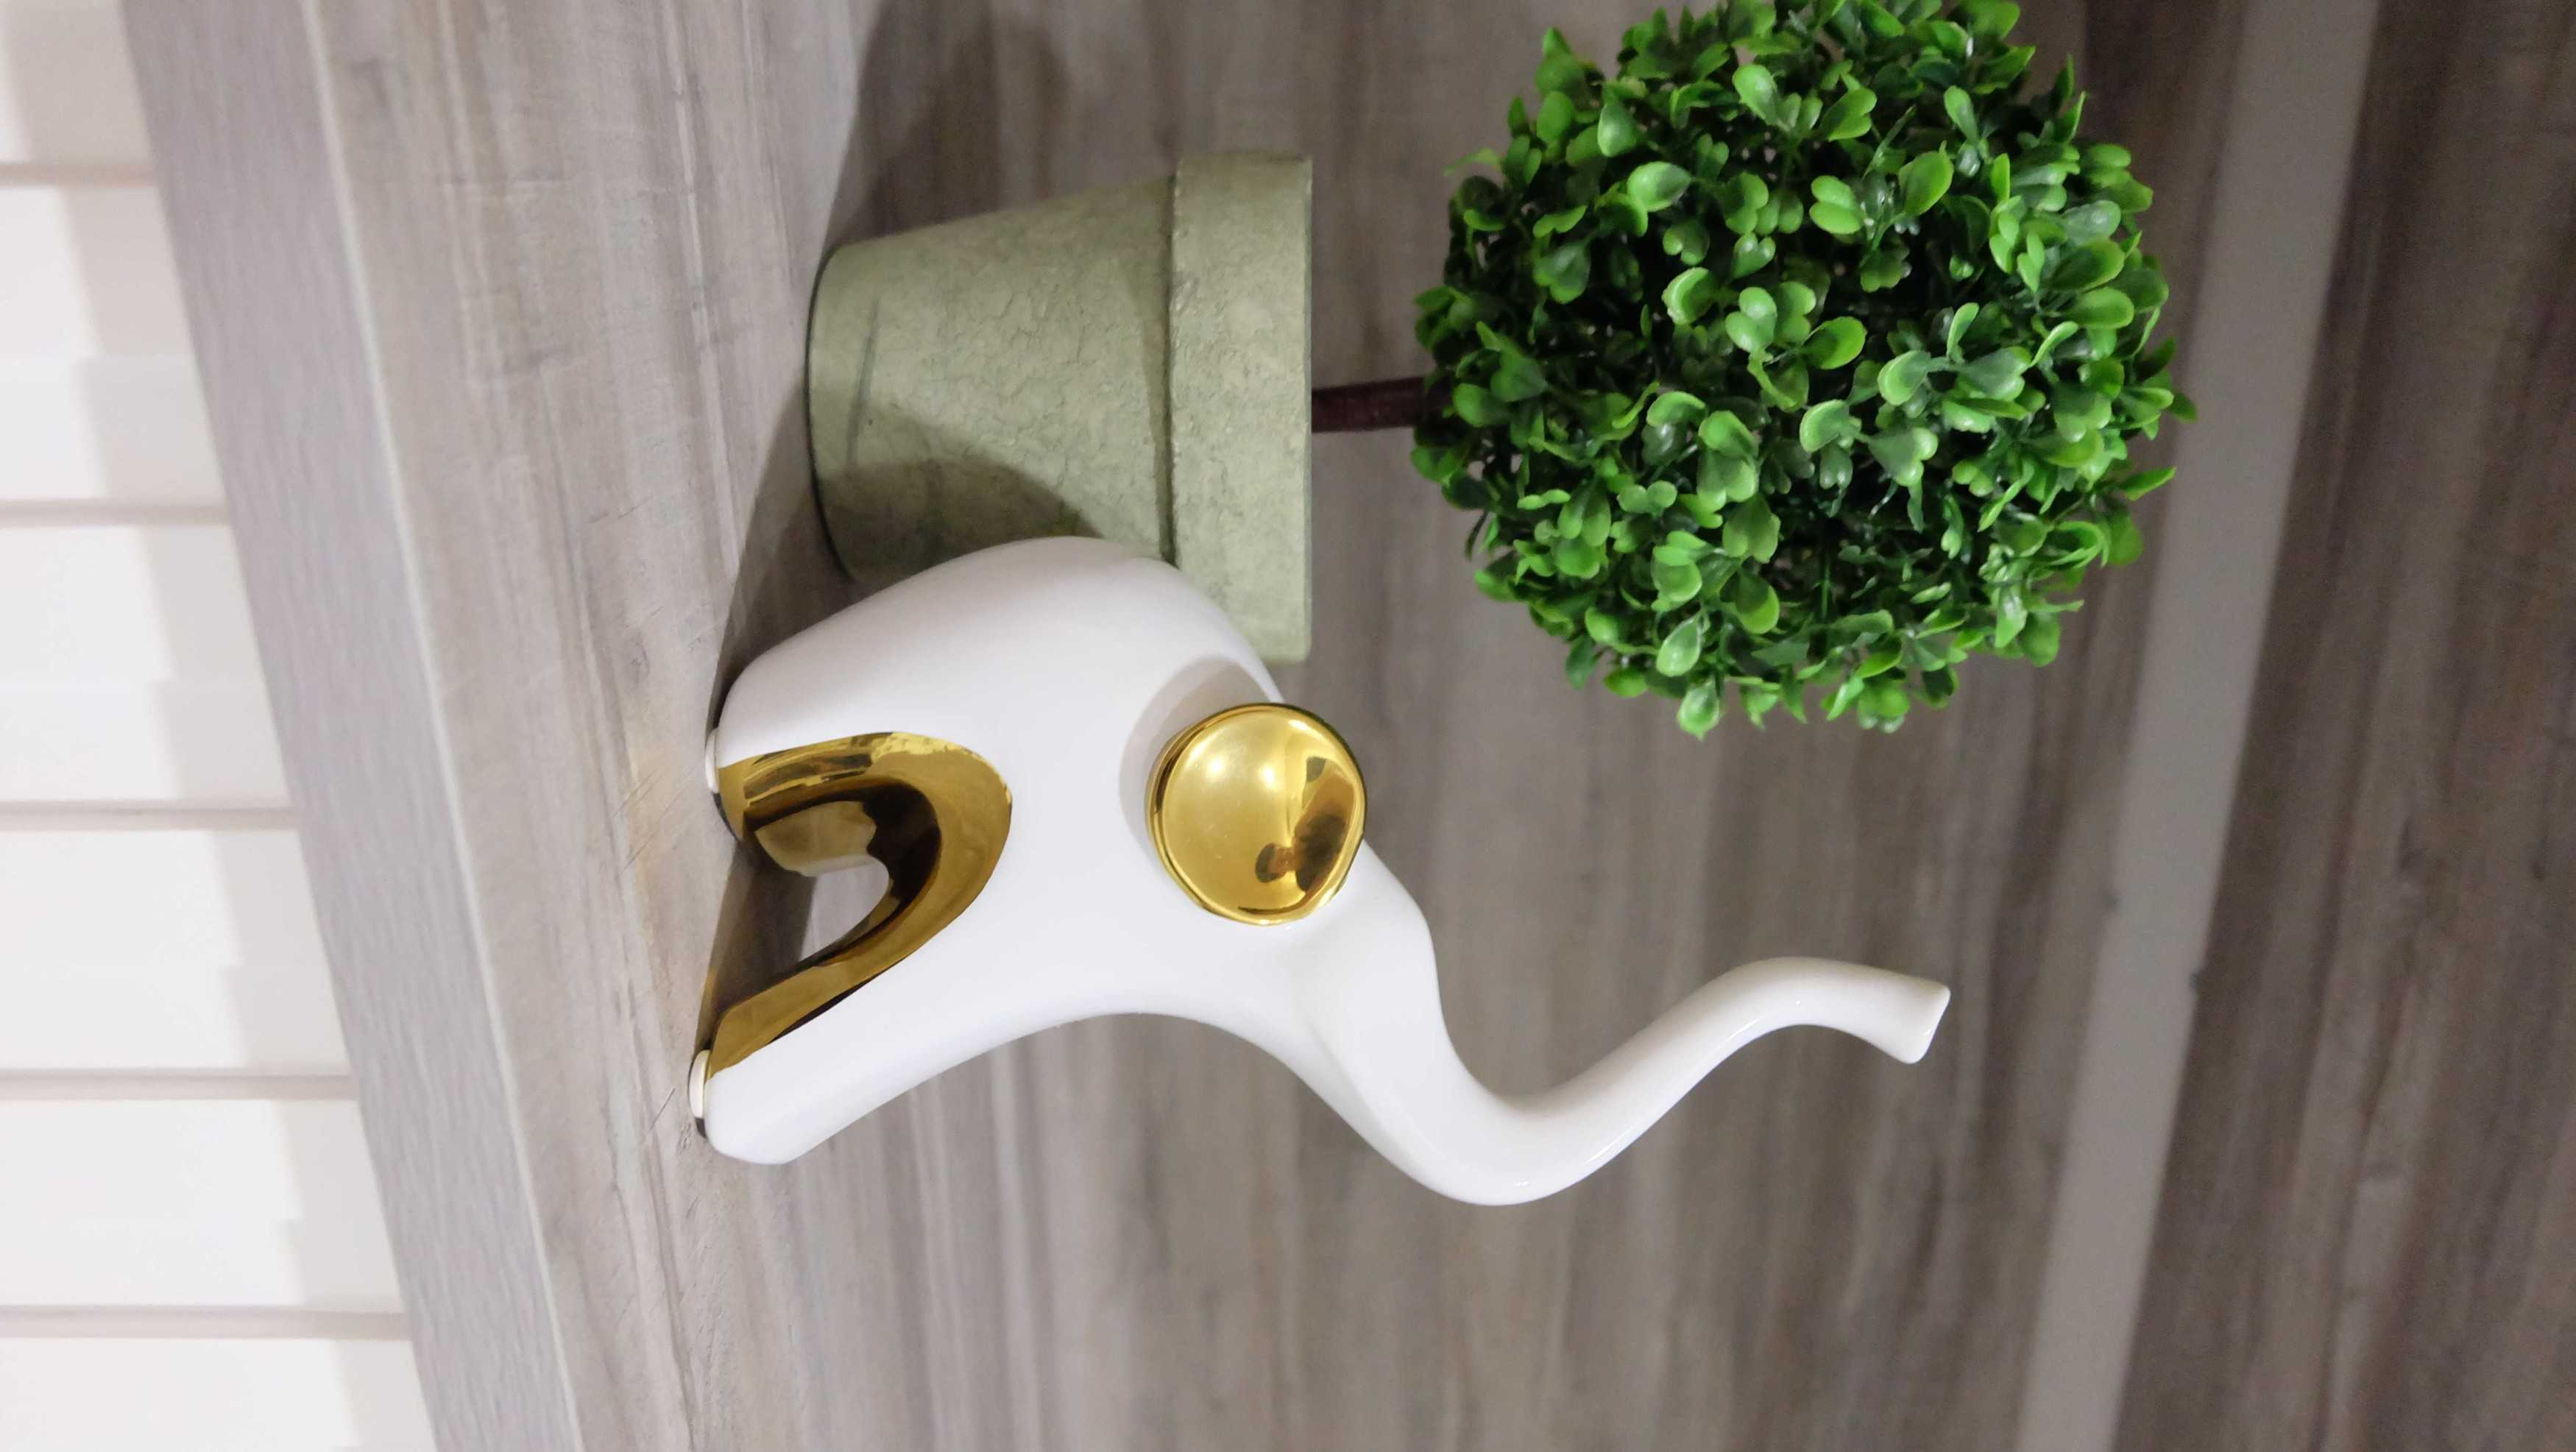 Oro Studio Mr Apartment Jakarta, Daerah Khusus Ibukota Jakarta, Indonesia Jakarta, Daerah Khusus Ibukota Jakarta, Indonesia Oro-Studio-Mr-Apartment   68480